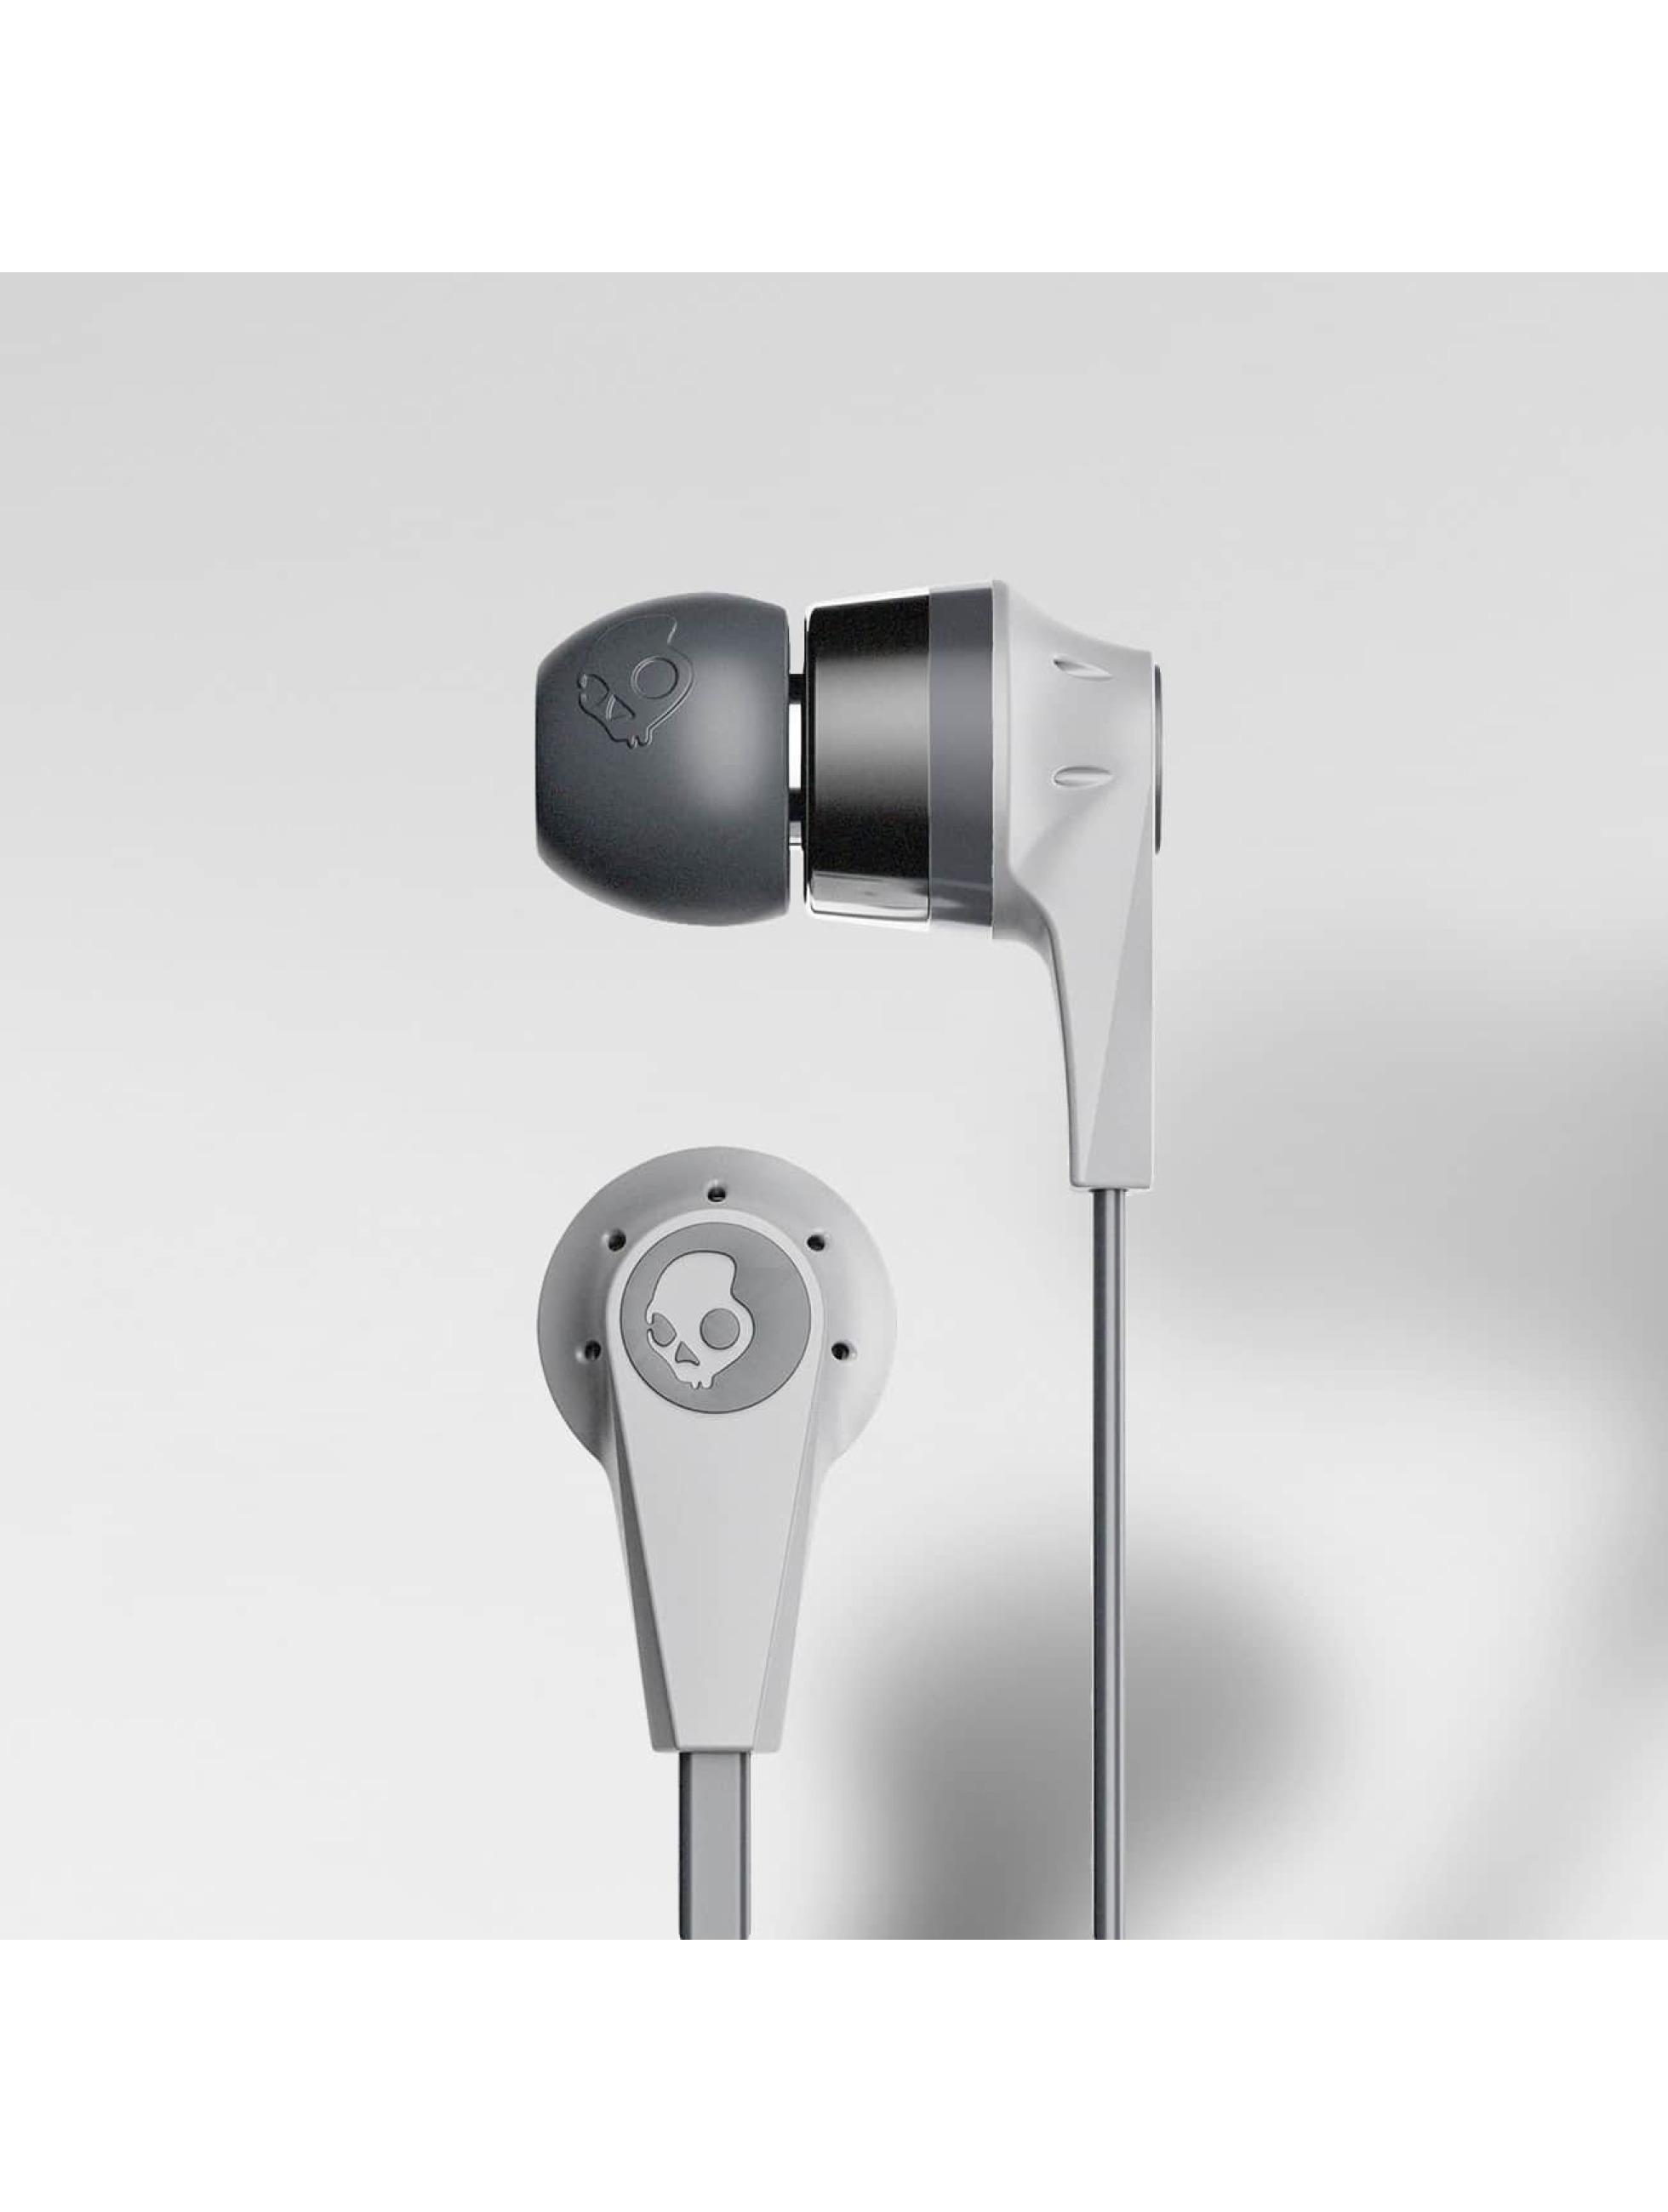 Skullcandy Kopfhörer Ink'd 2.0 Wireless In grau